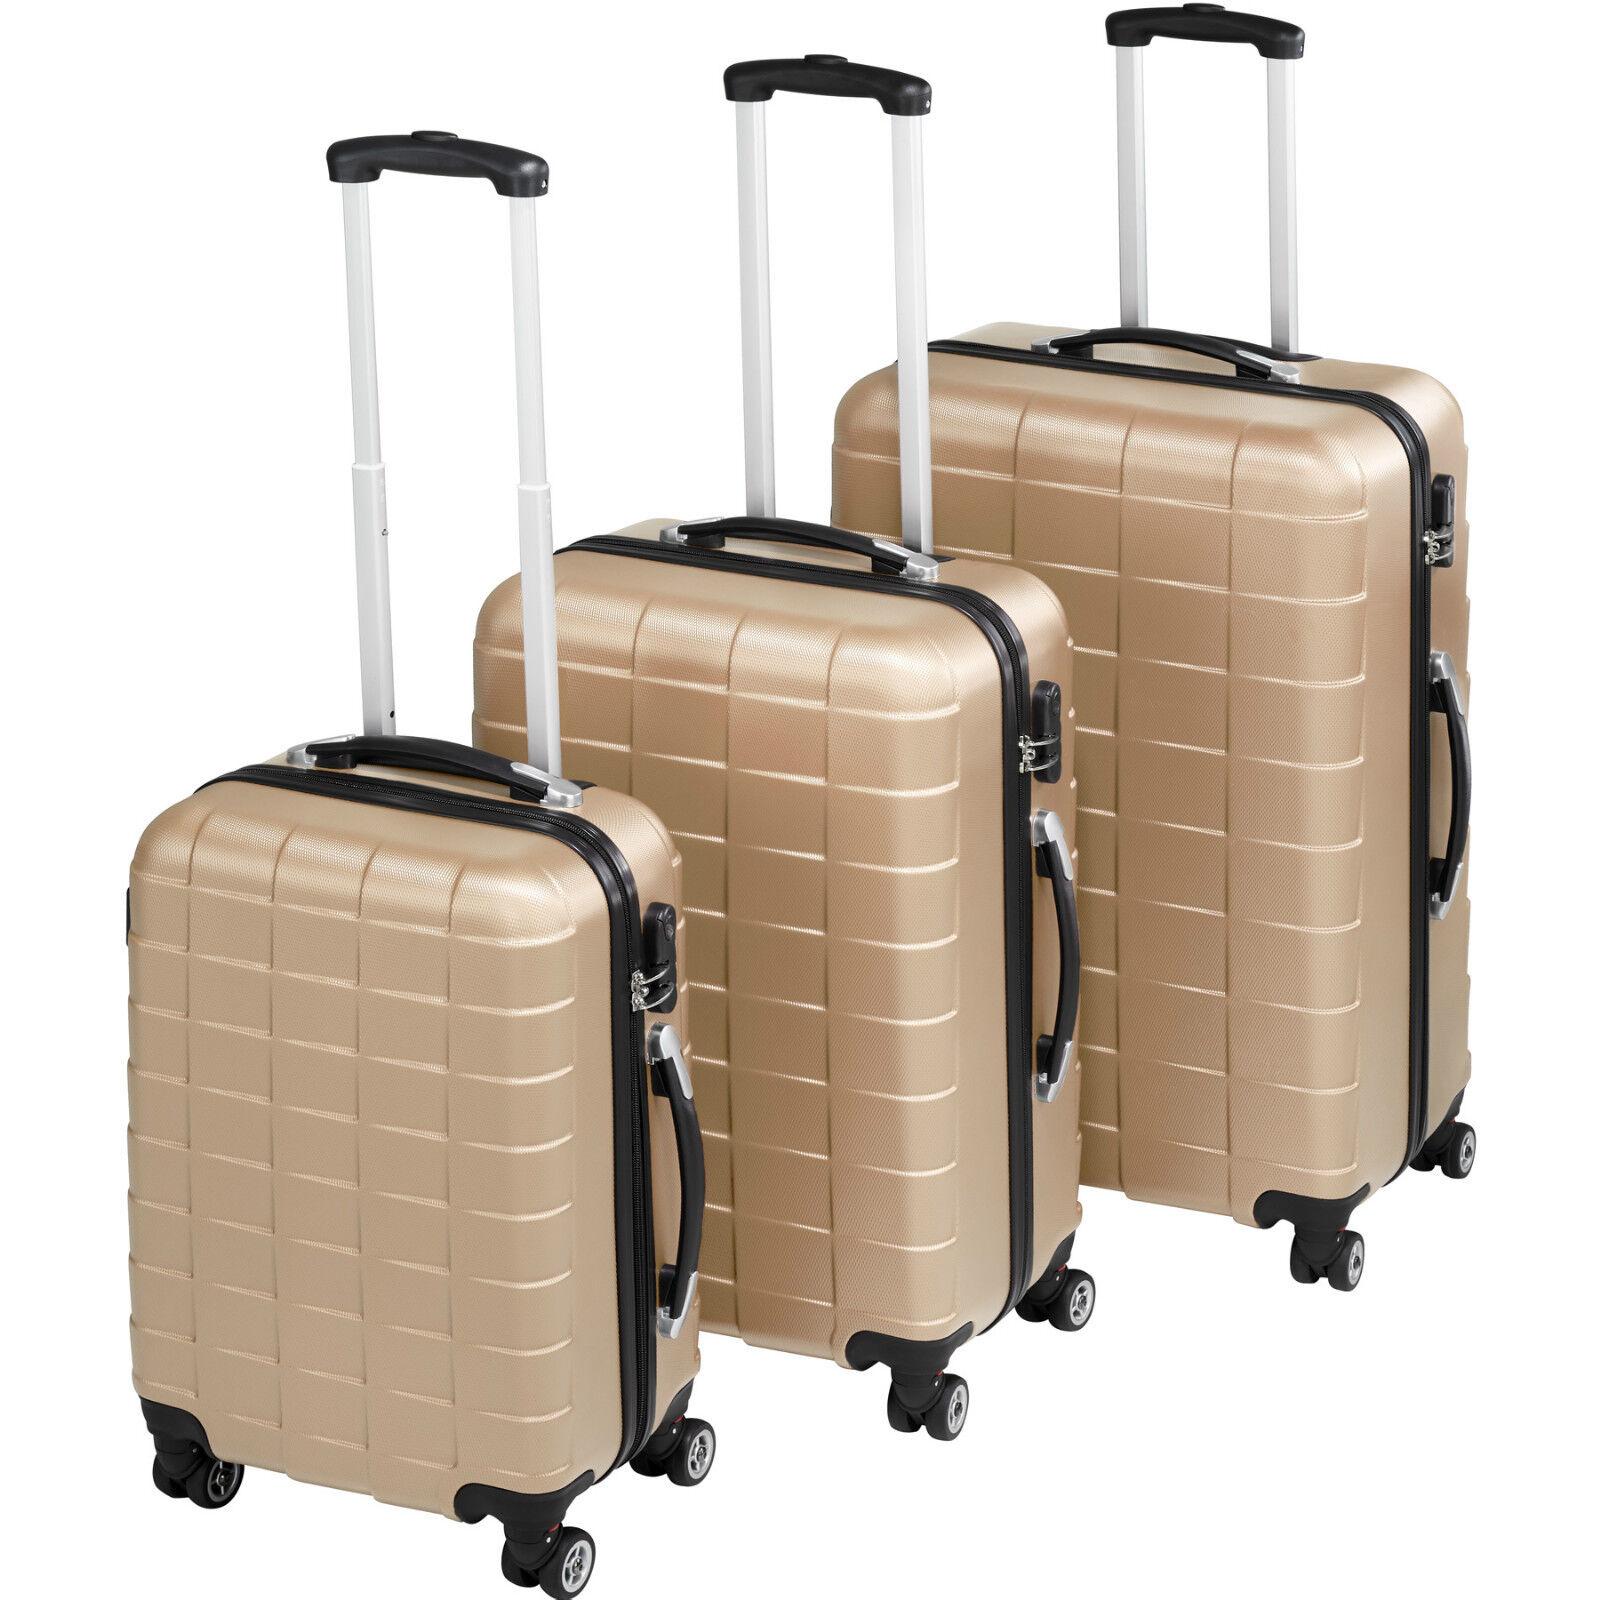 Set de 3 valises voyage coque ABS léger rigide borsaages valise trolley champagne